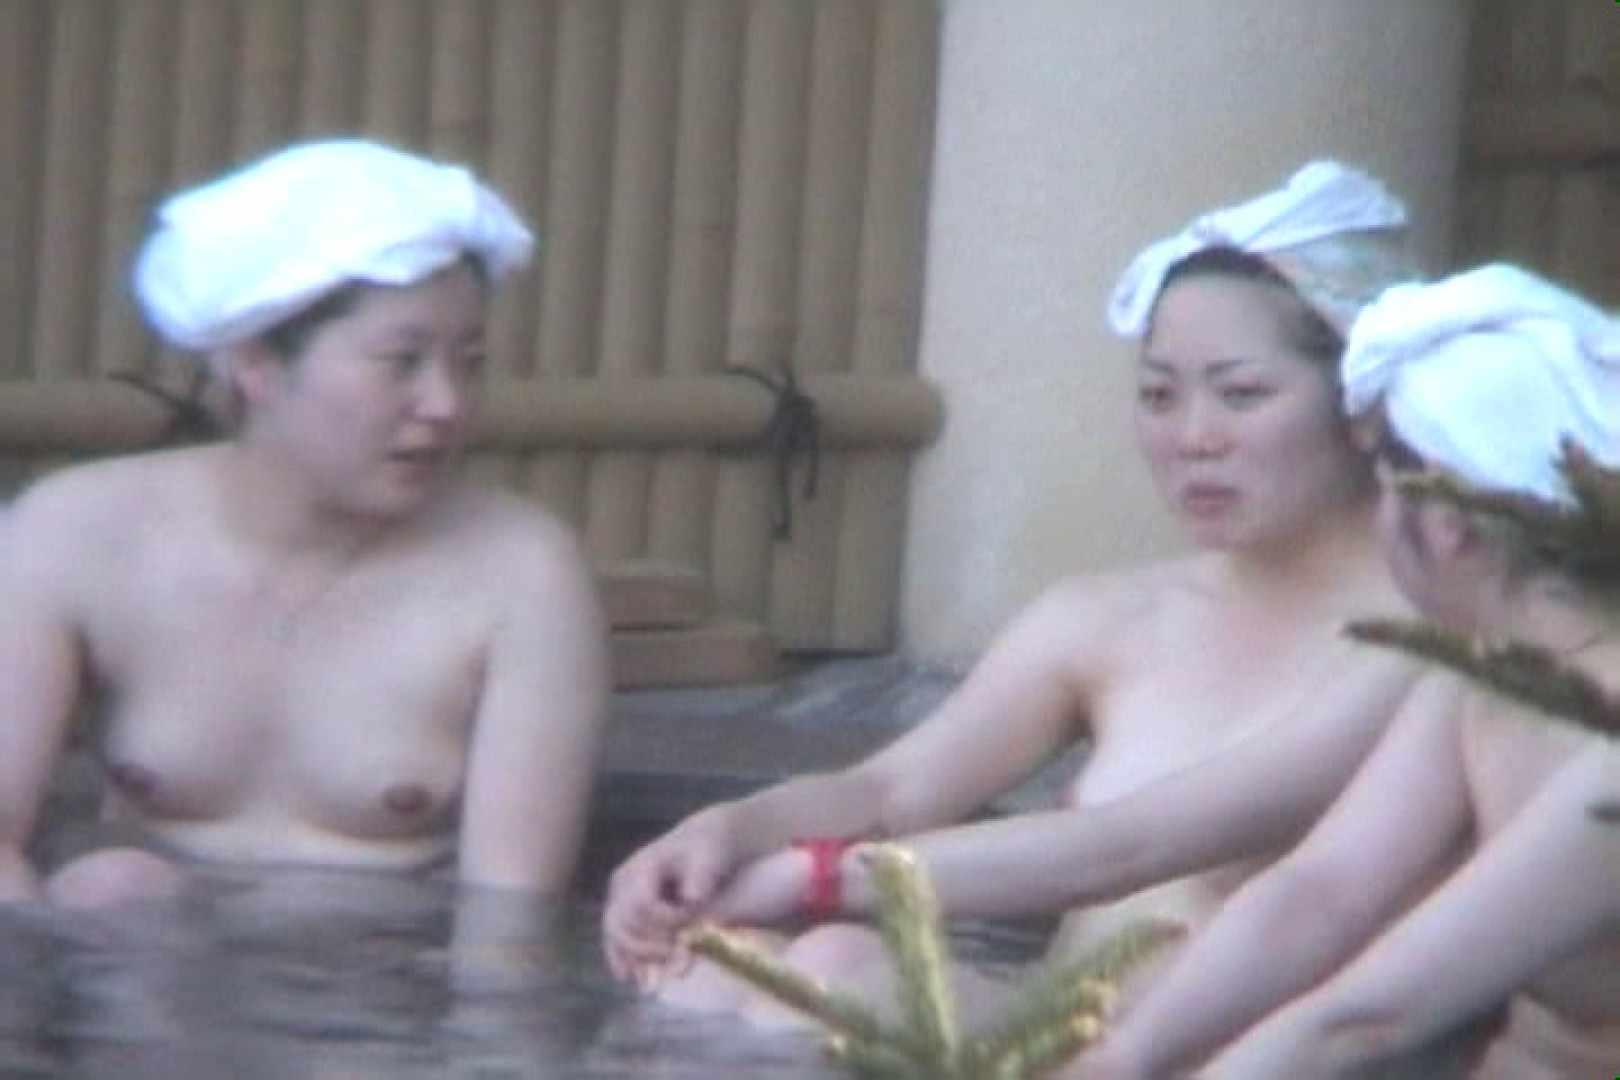 Aquaな露天風呂Vol.86【VIP限定】 OLのエロ生活 オマンコ無修正動画無料 96連発 32